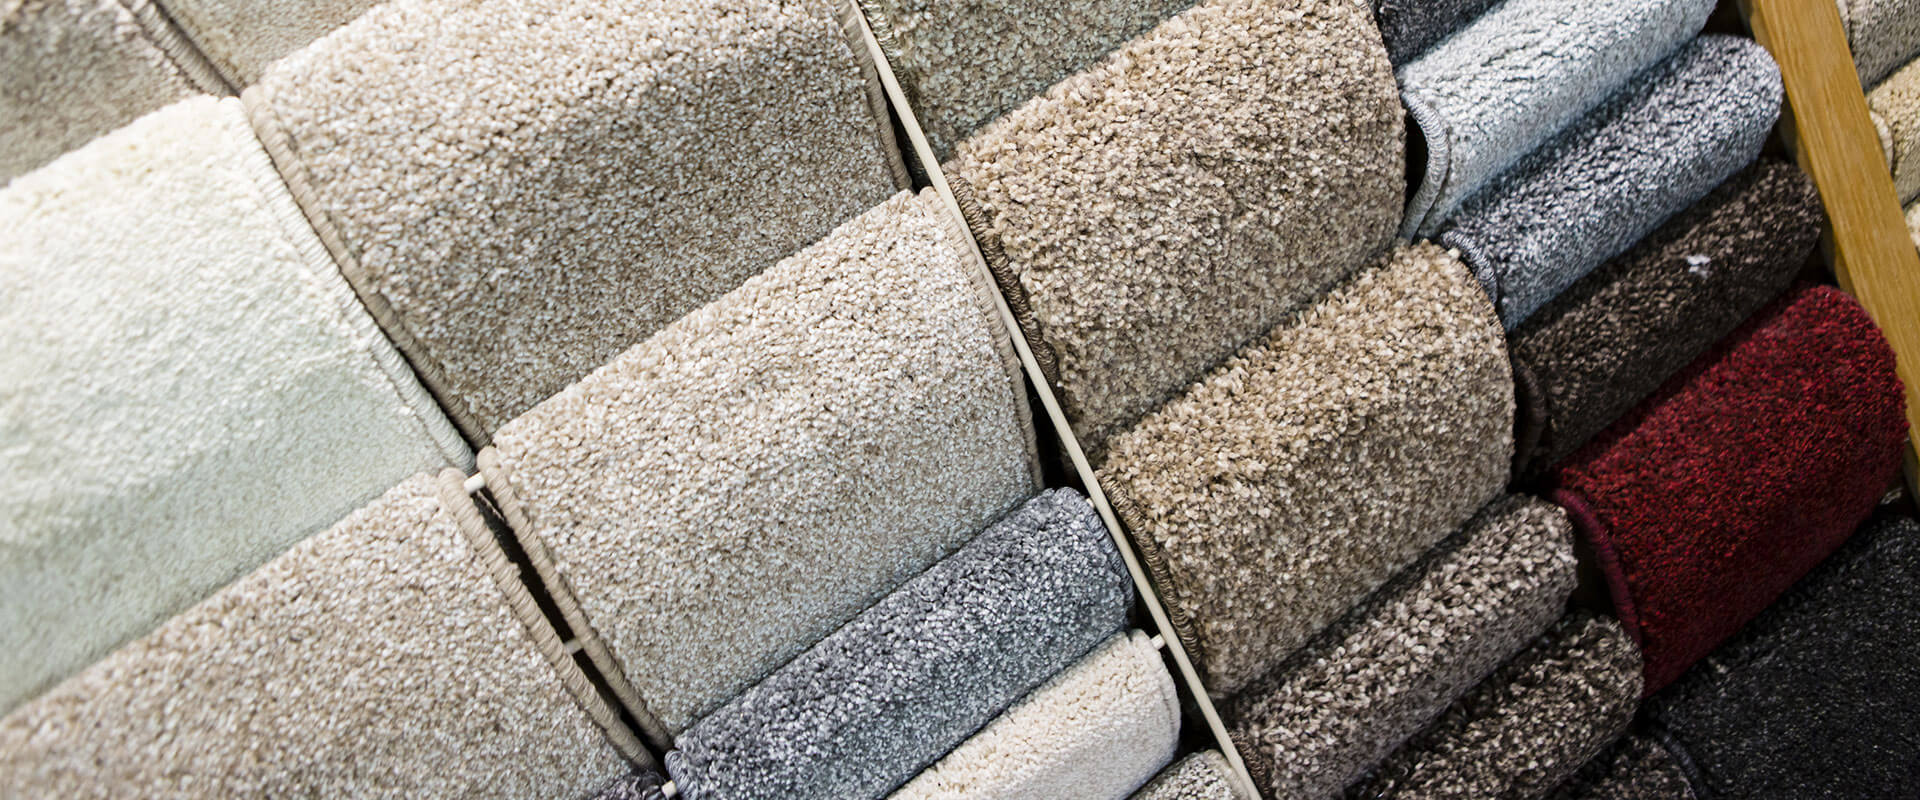 Rug & carpet samples